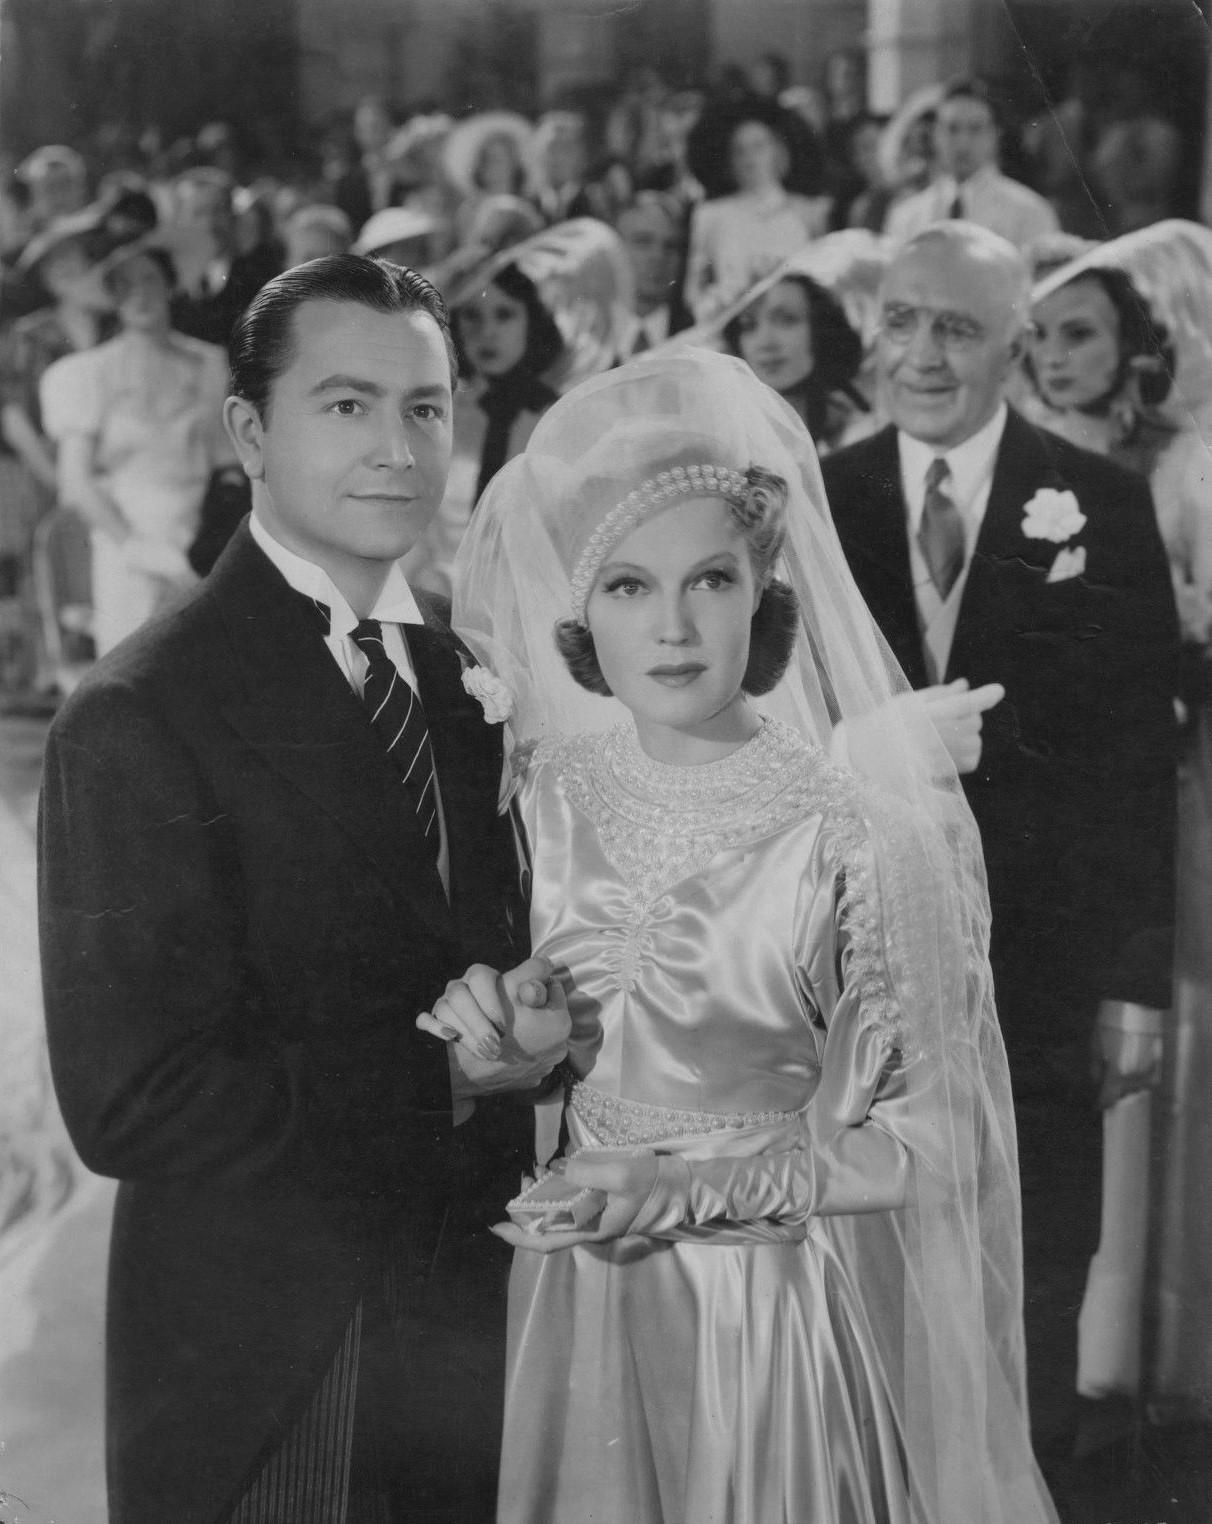 Robert Young and Rita Johnson in Honolulu (1939)